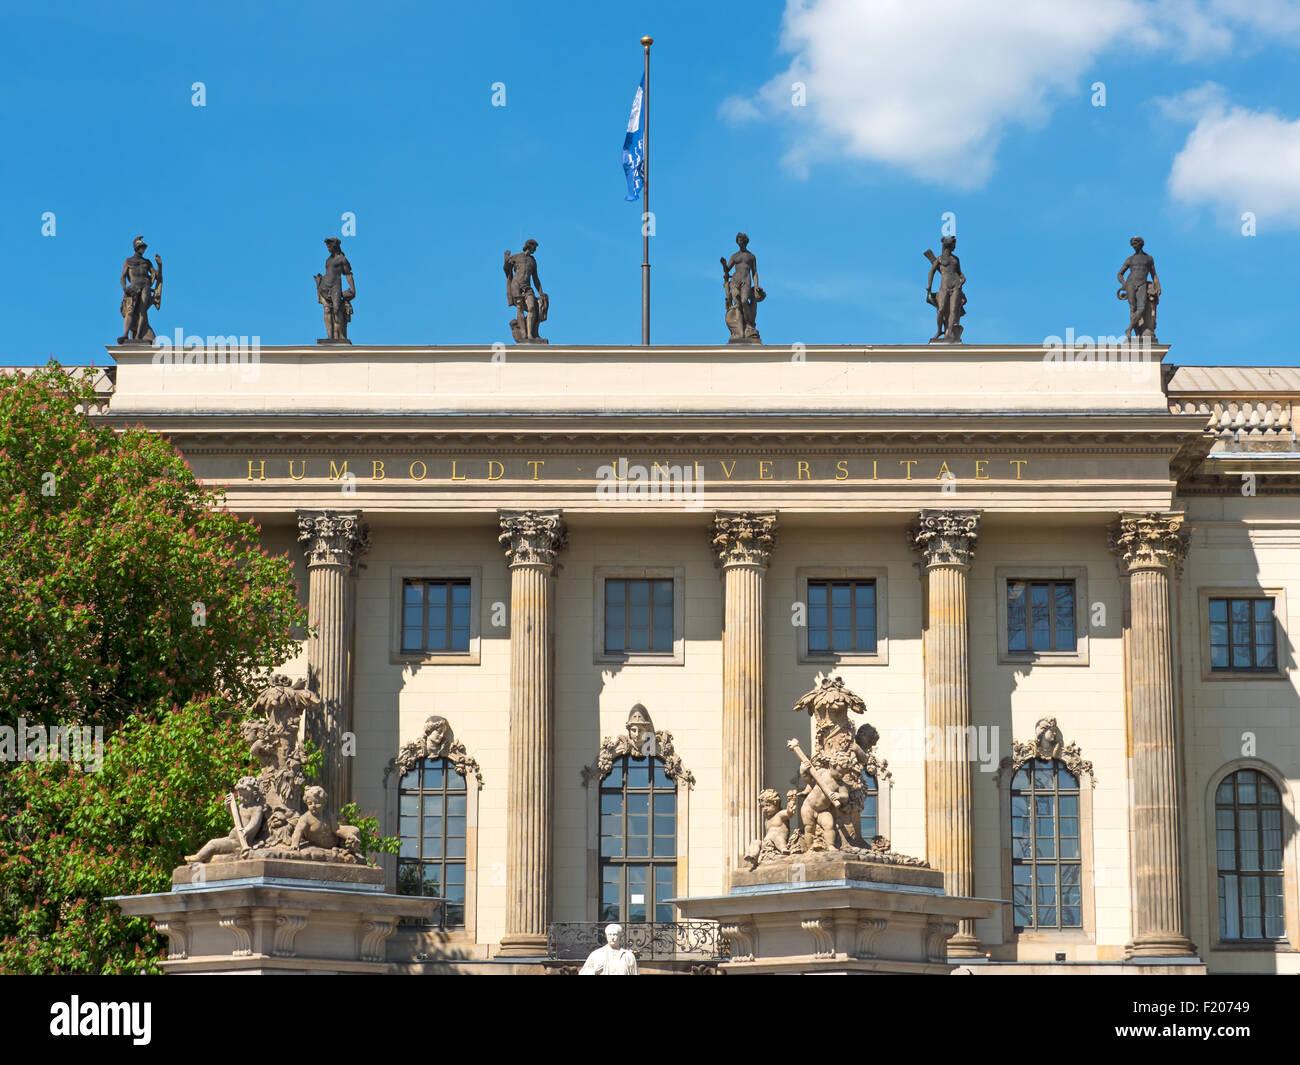 Fassade der Humboldt Universität Berlin - Stock Image